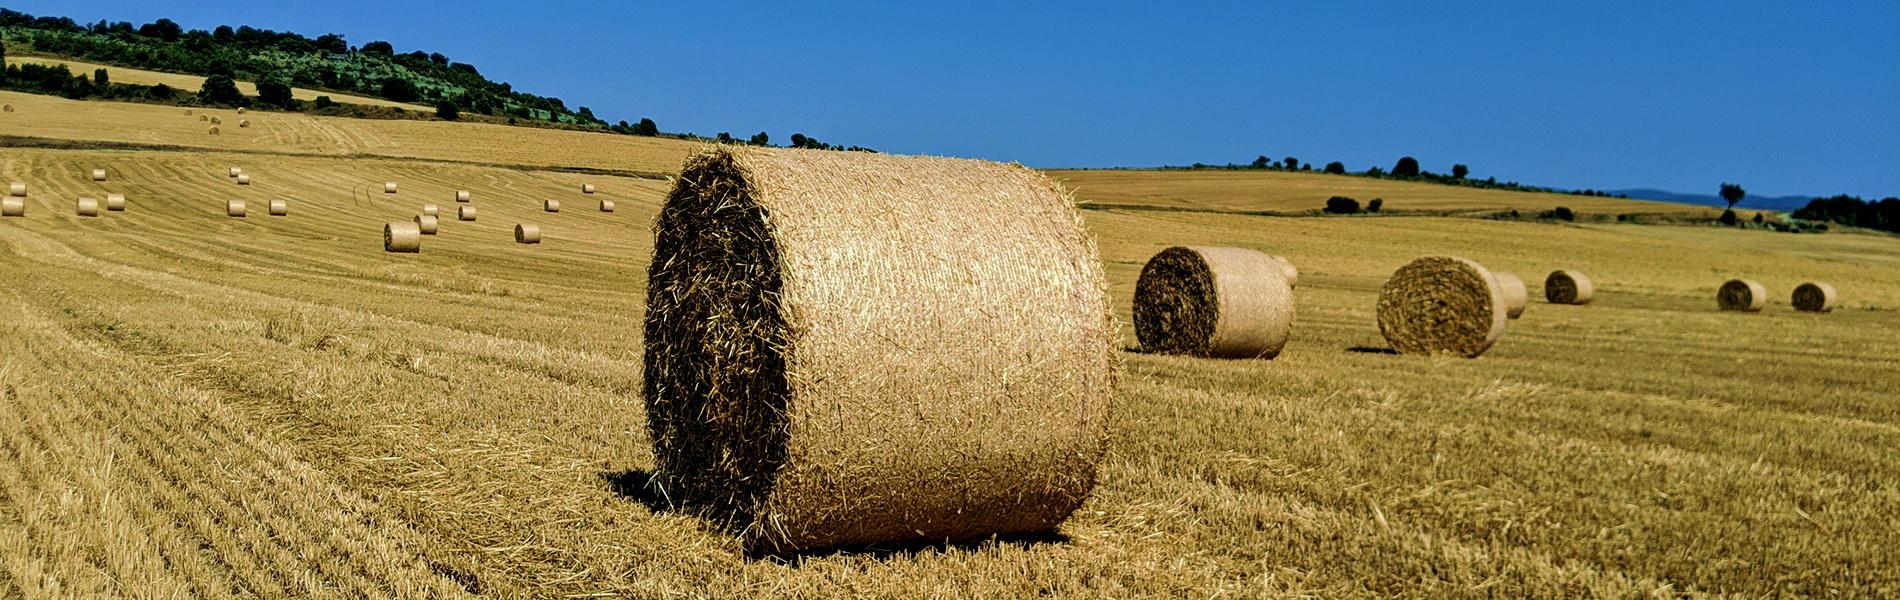 campo-cereal-con-bolas